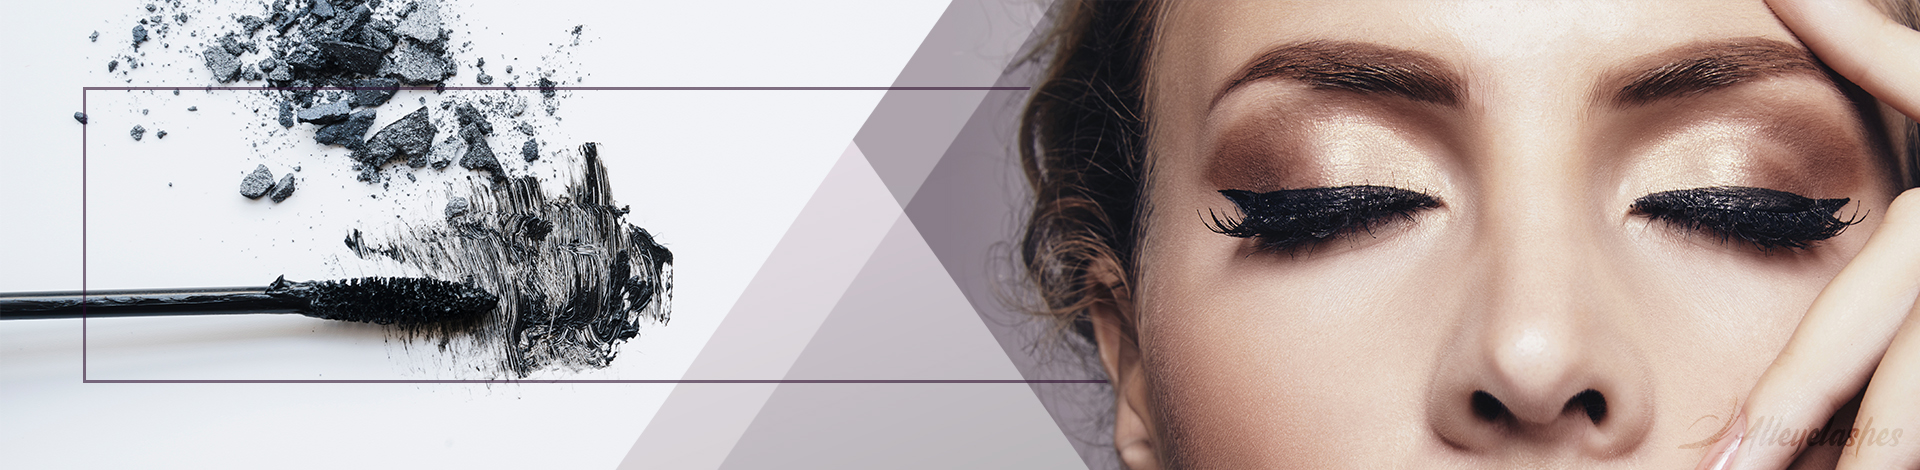 Do You Apply Mascara on Fake Eyelashes? [Deciding What to Do]